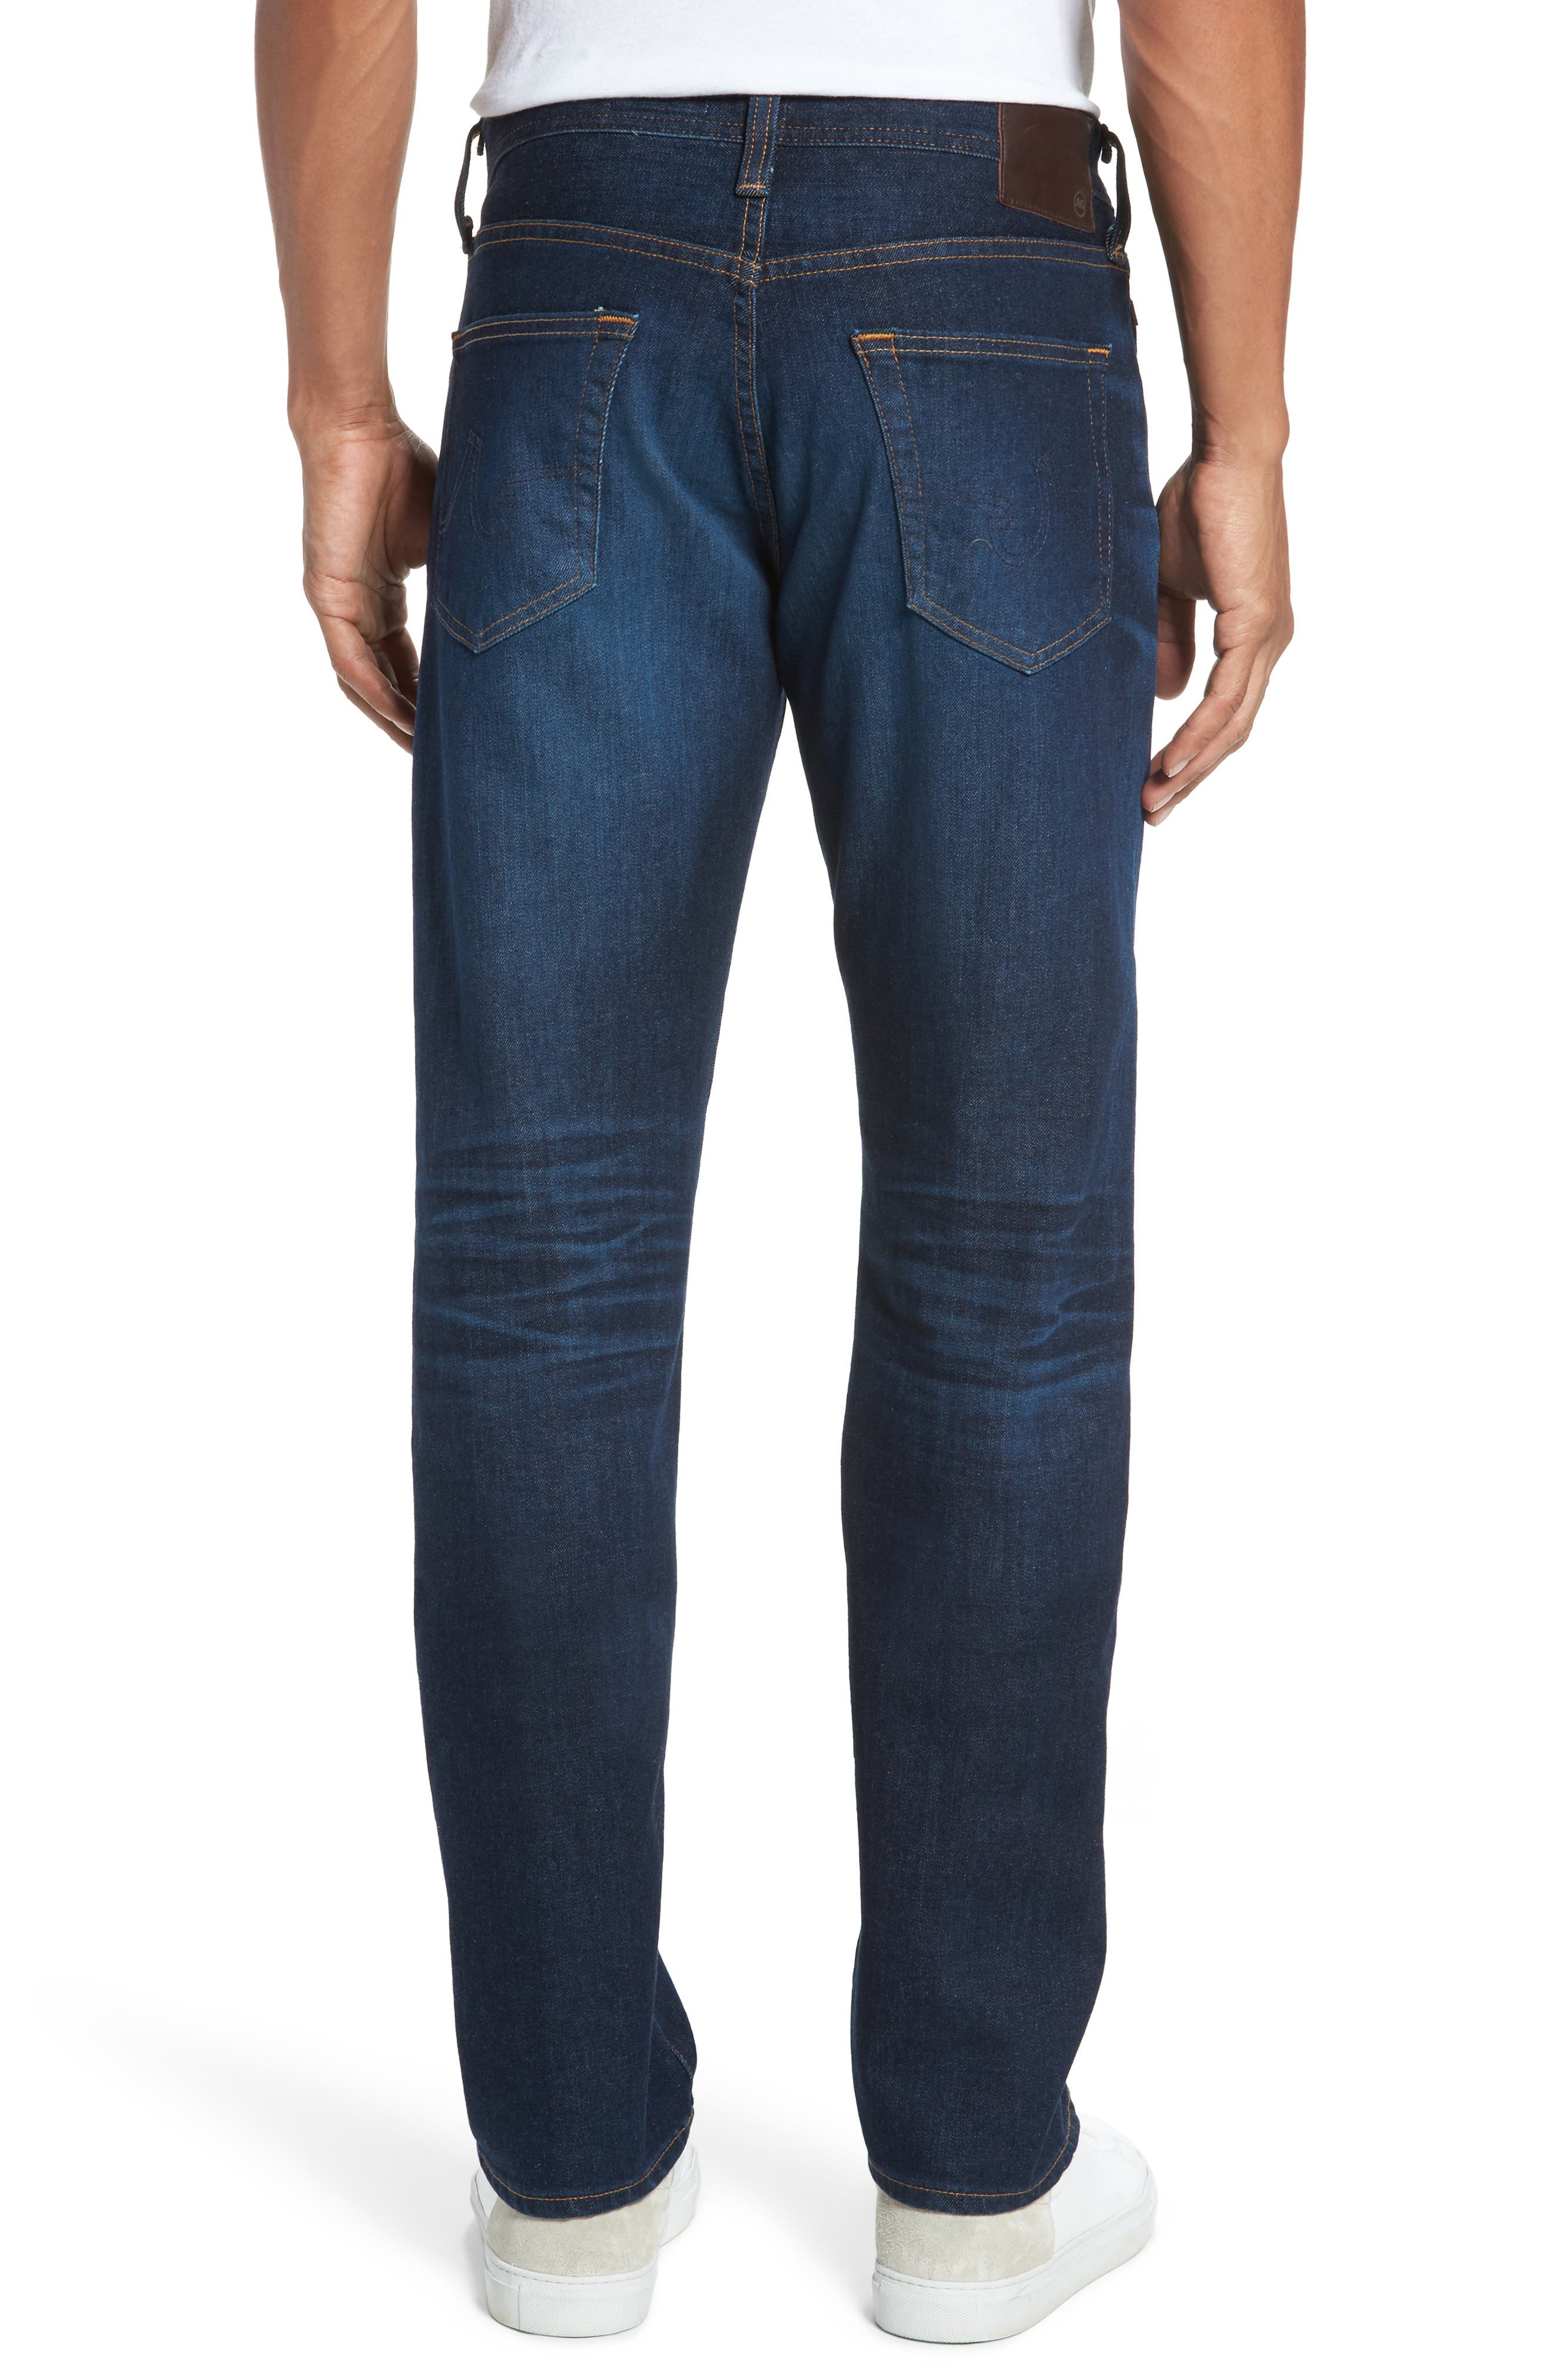 Graduate Slim Straight Fit Jeans,                             Alternate thumbnail 2, color,                             5 Years Porter